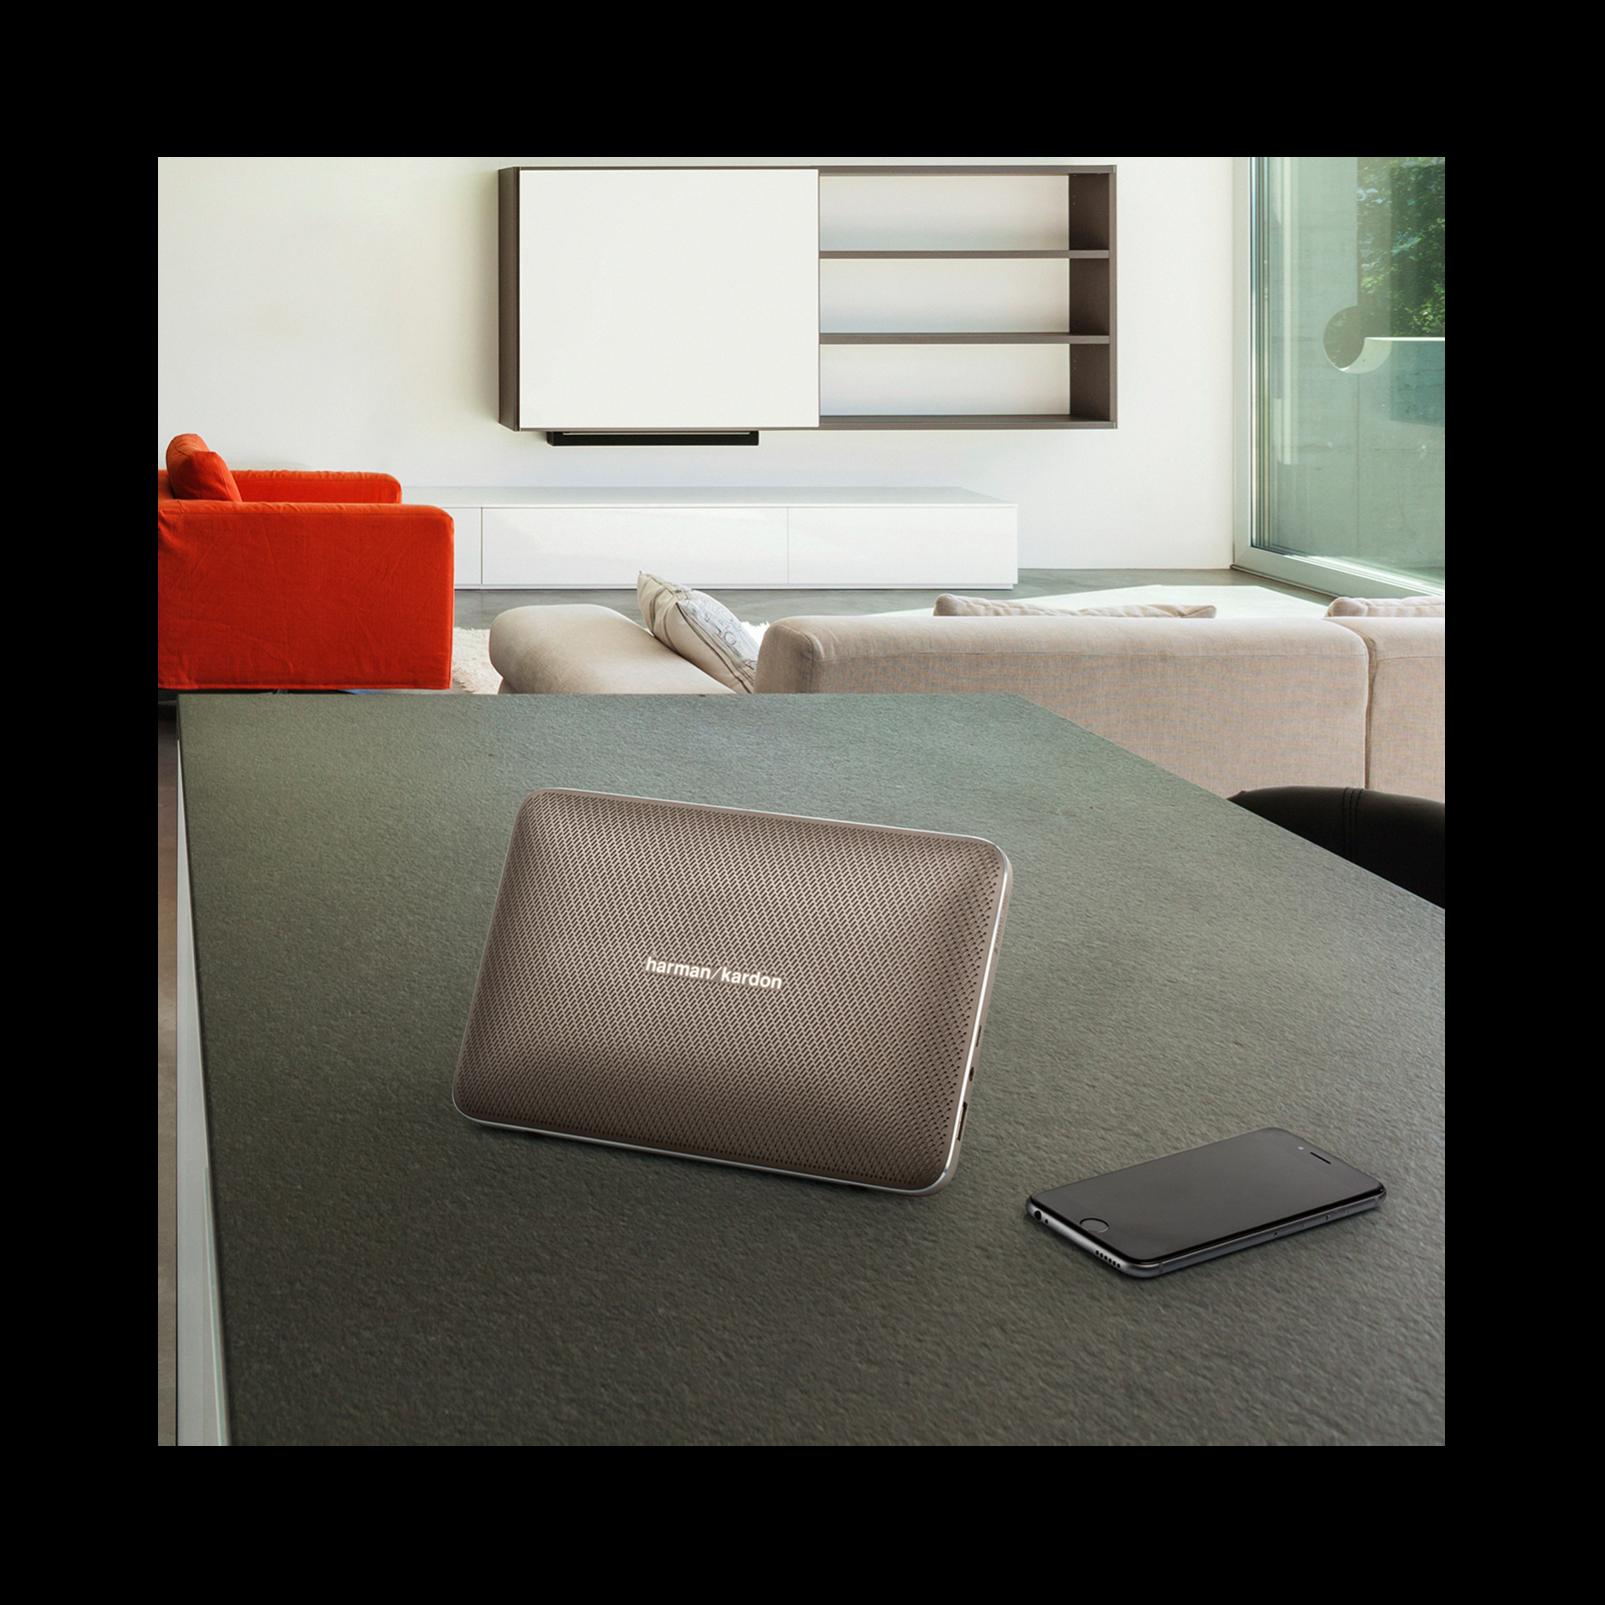 Esquire 2 - Grey - Premium portable Bluetooth speaker with quad microphone conferencing system - Detailshot 7